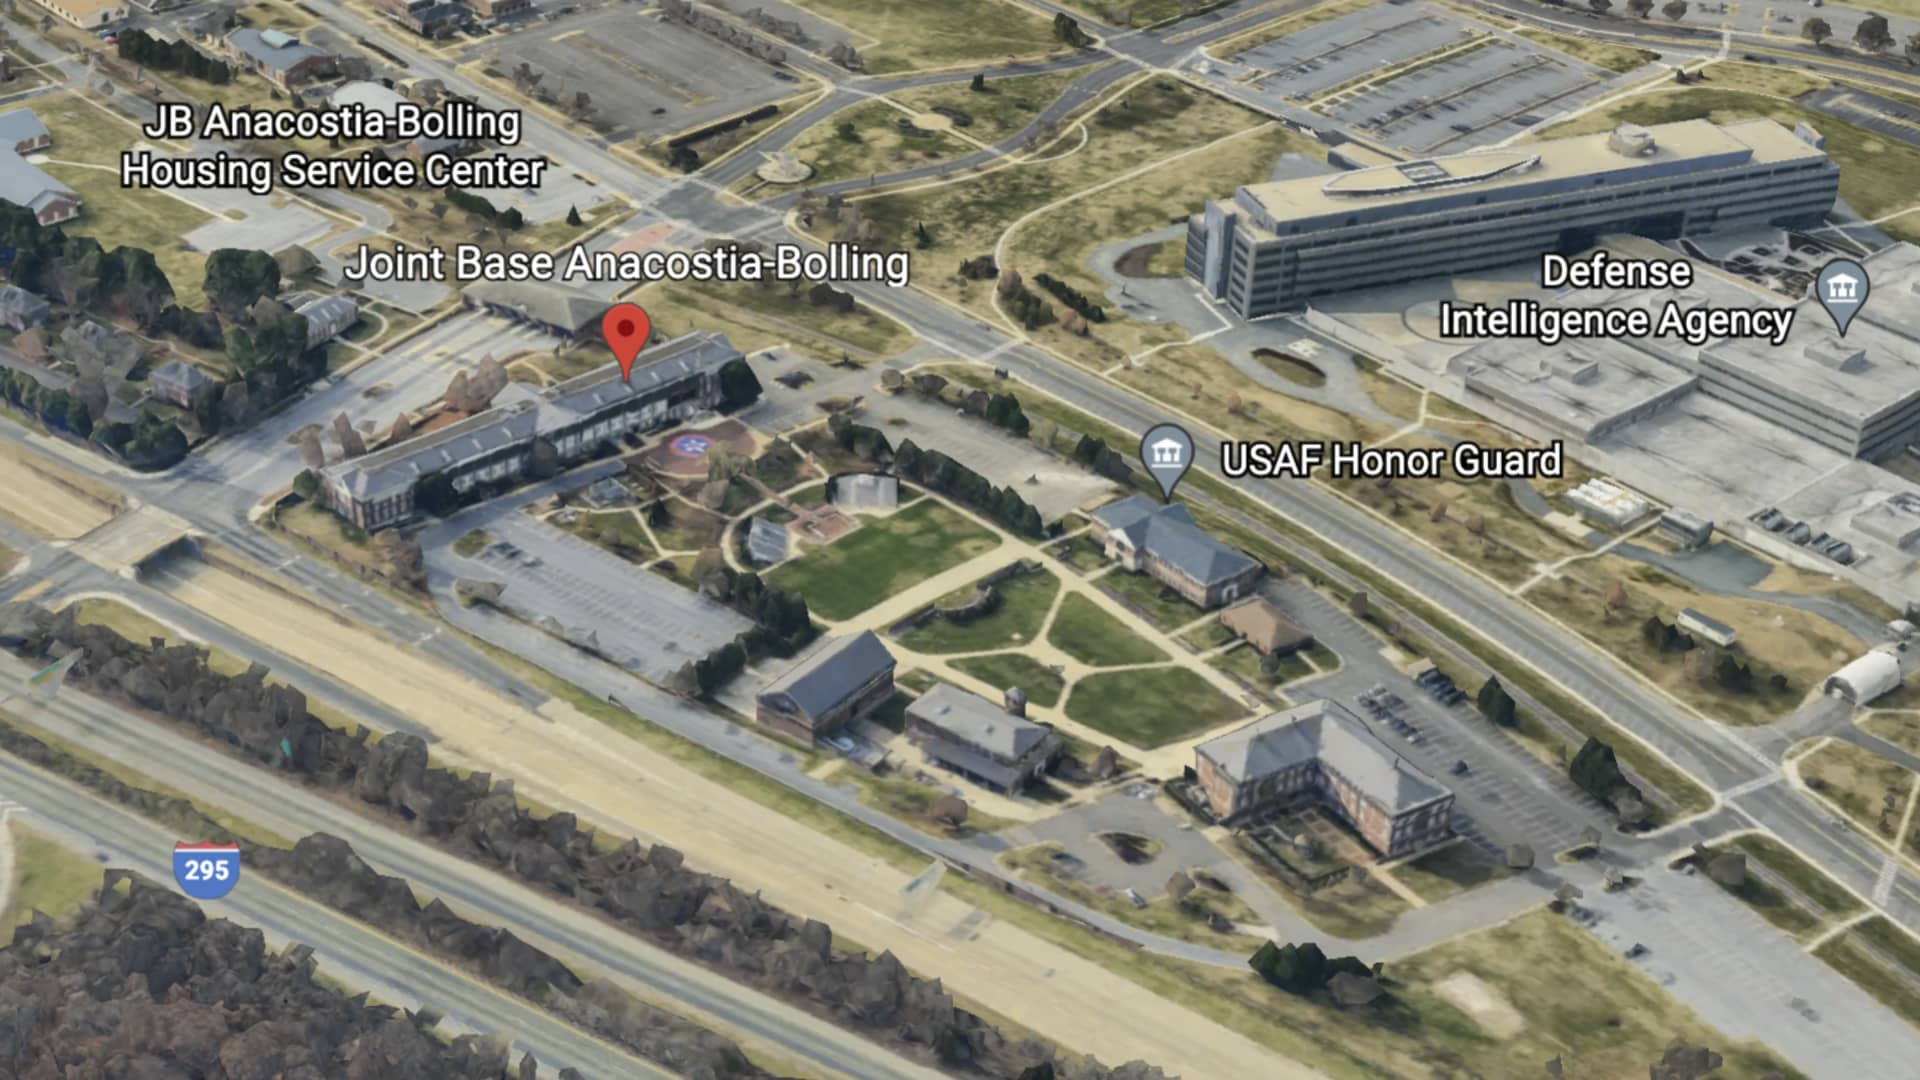 Google Earth viewo of Anacostia-Bolling Air Force Base, DC.